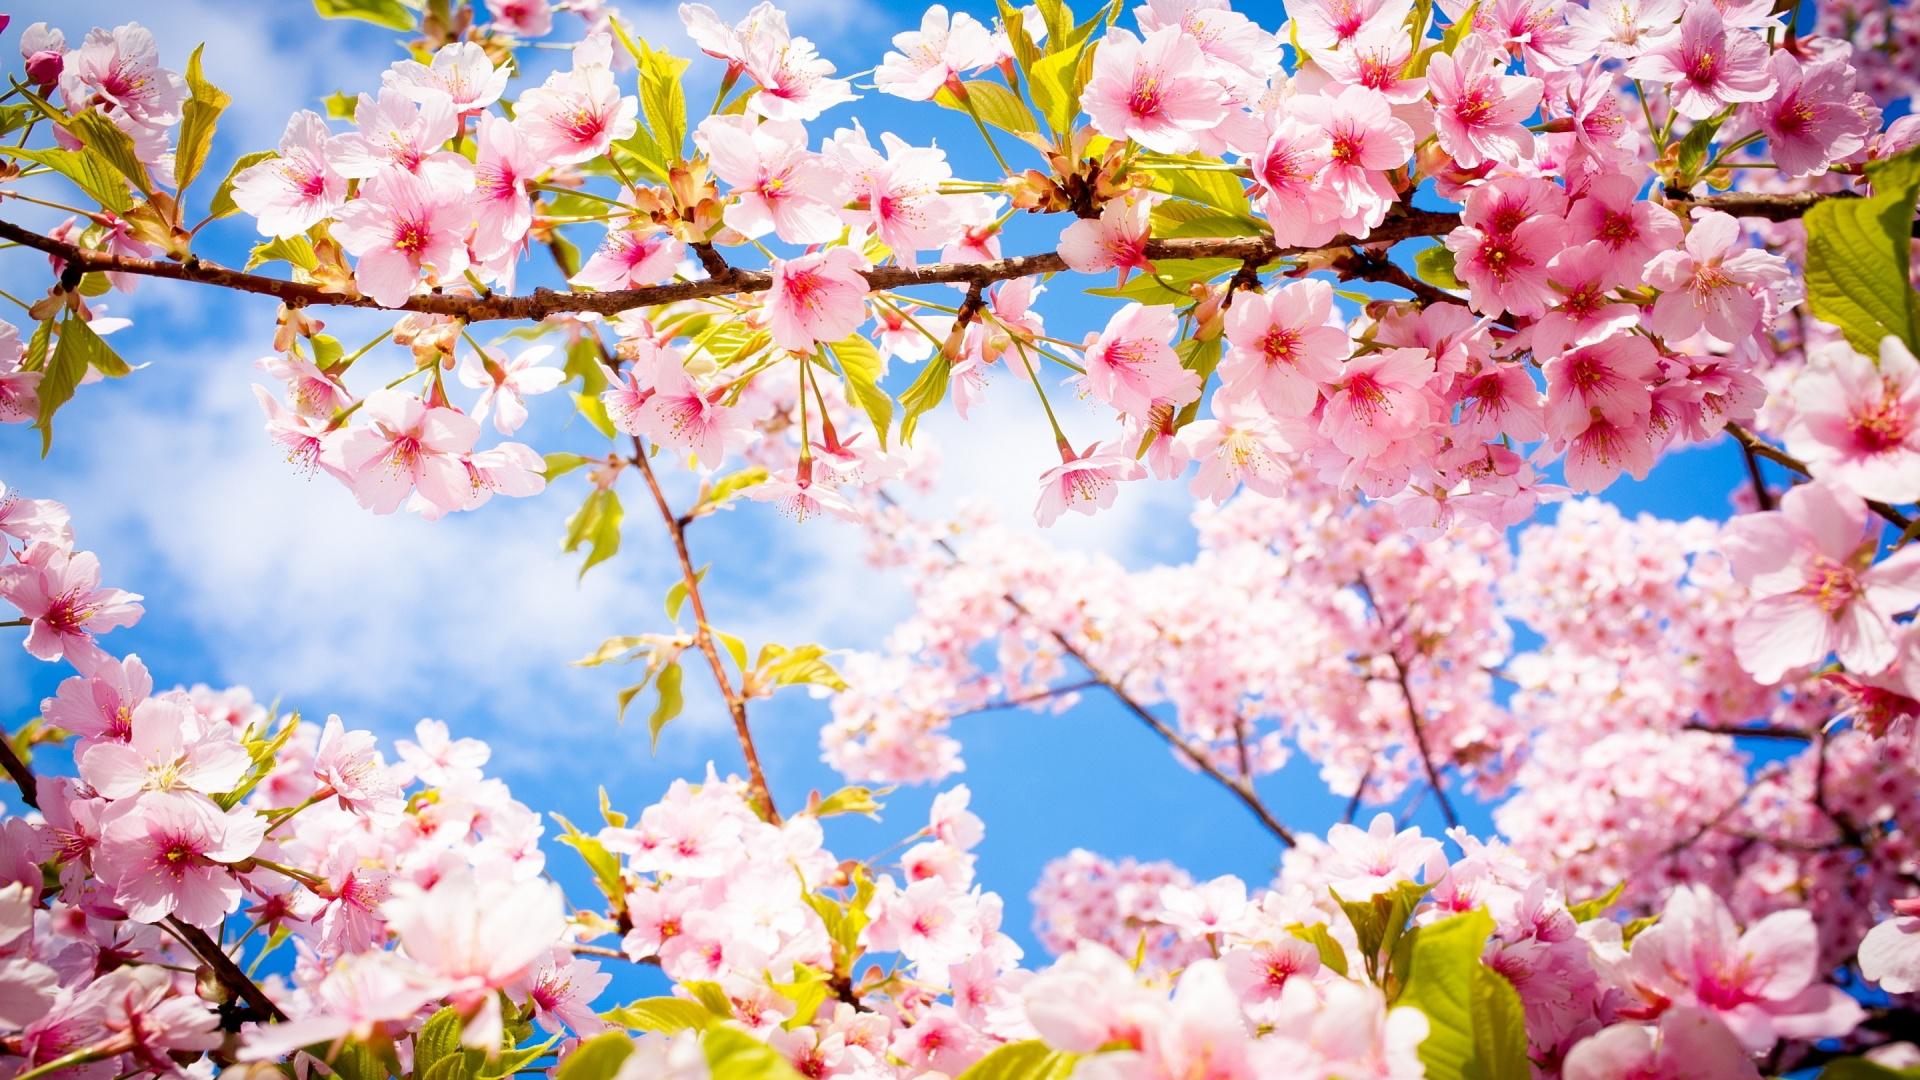 Cherry Blossom · Cherry Blossom · Cherry Blossom ...